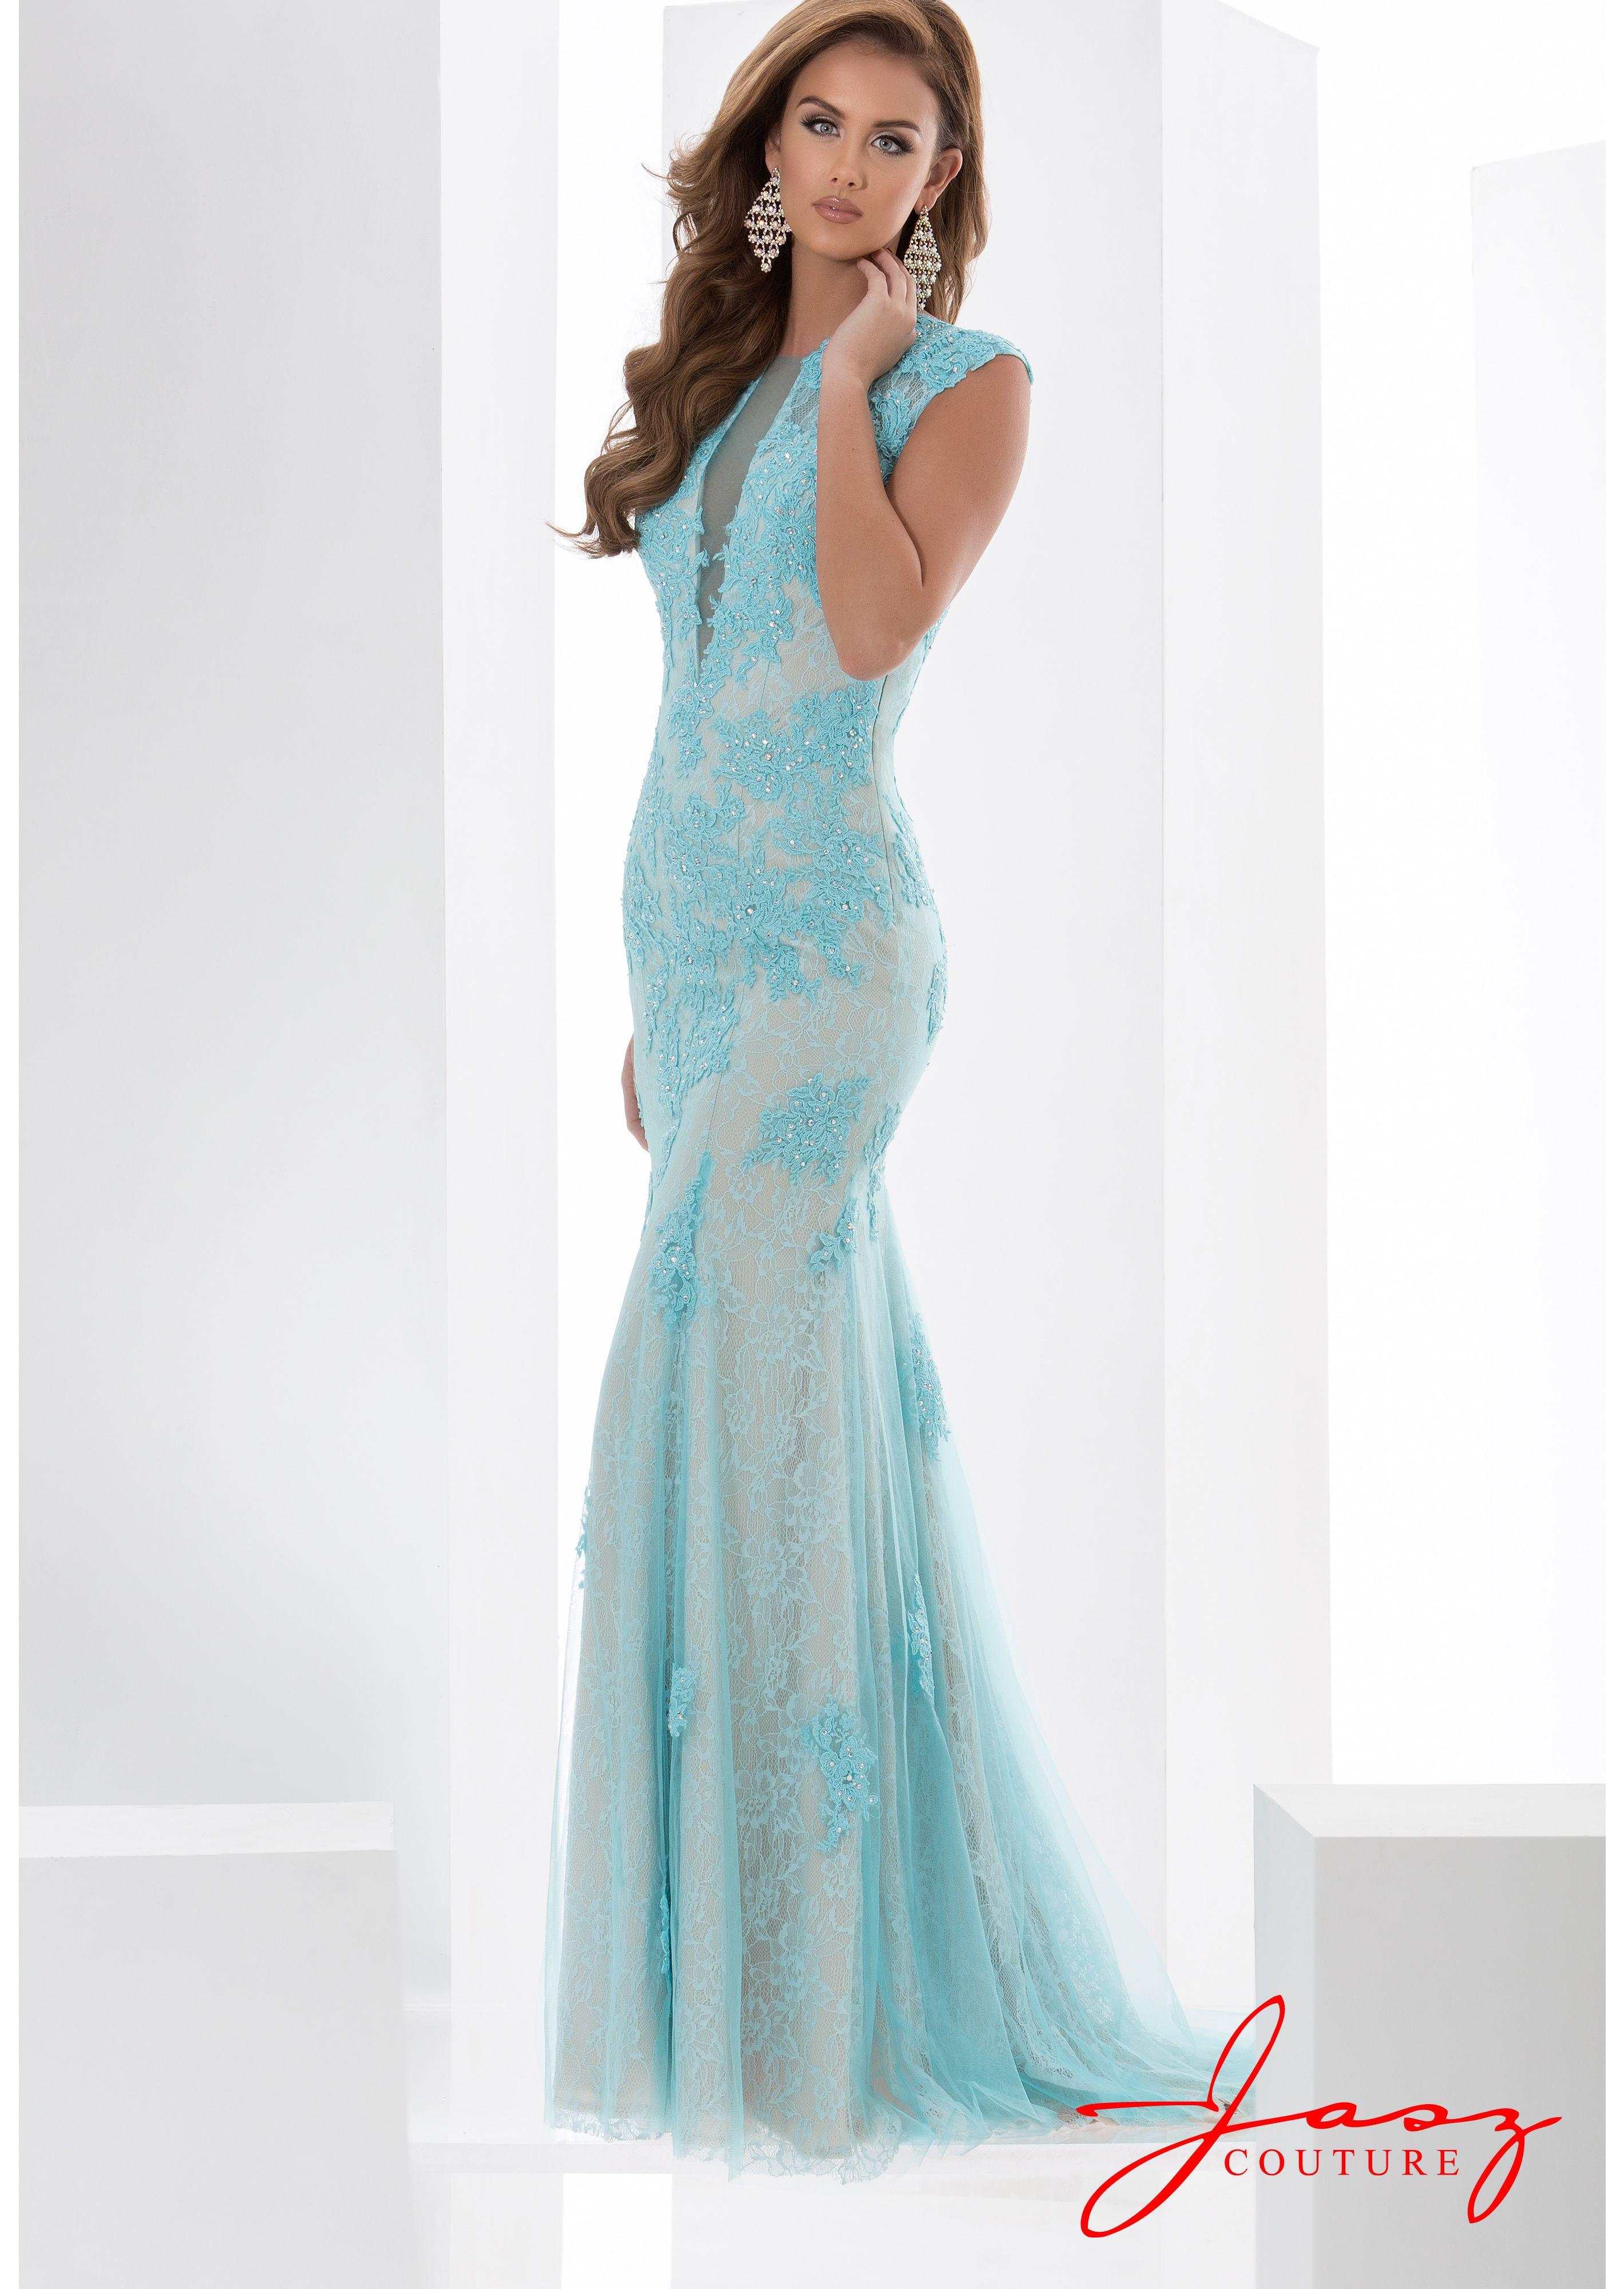 Jasz Couture Spring 2016 | Jasz Couture Prom Dresses | Pinterest ...